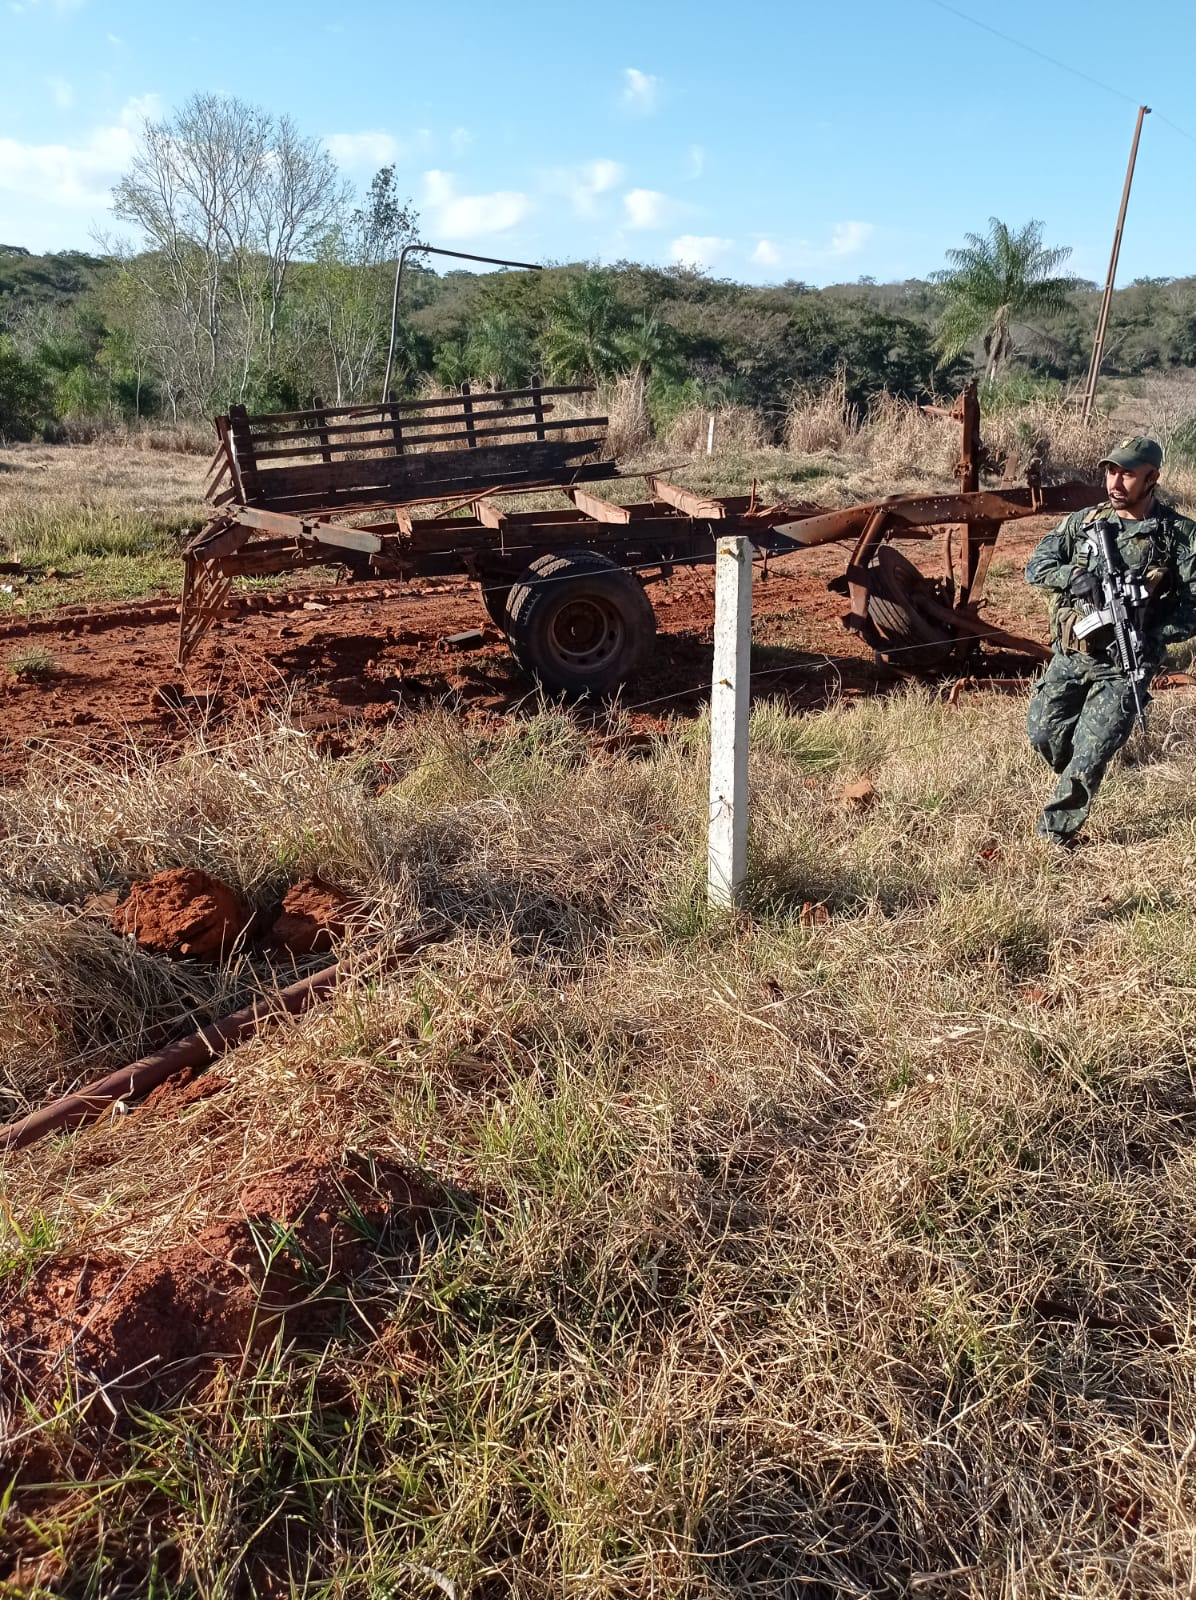 Militares en la zona donde ocurrió el ataque. (Gentileza)